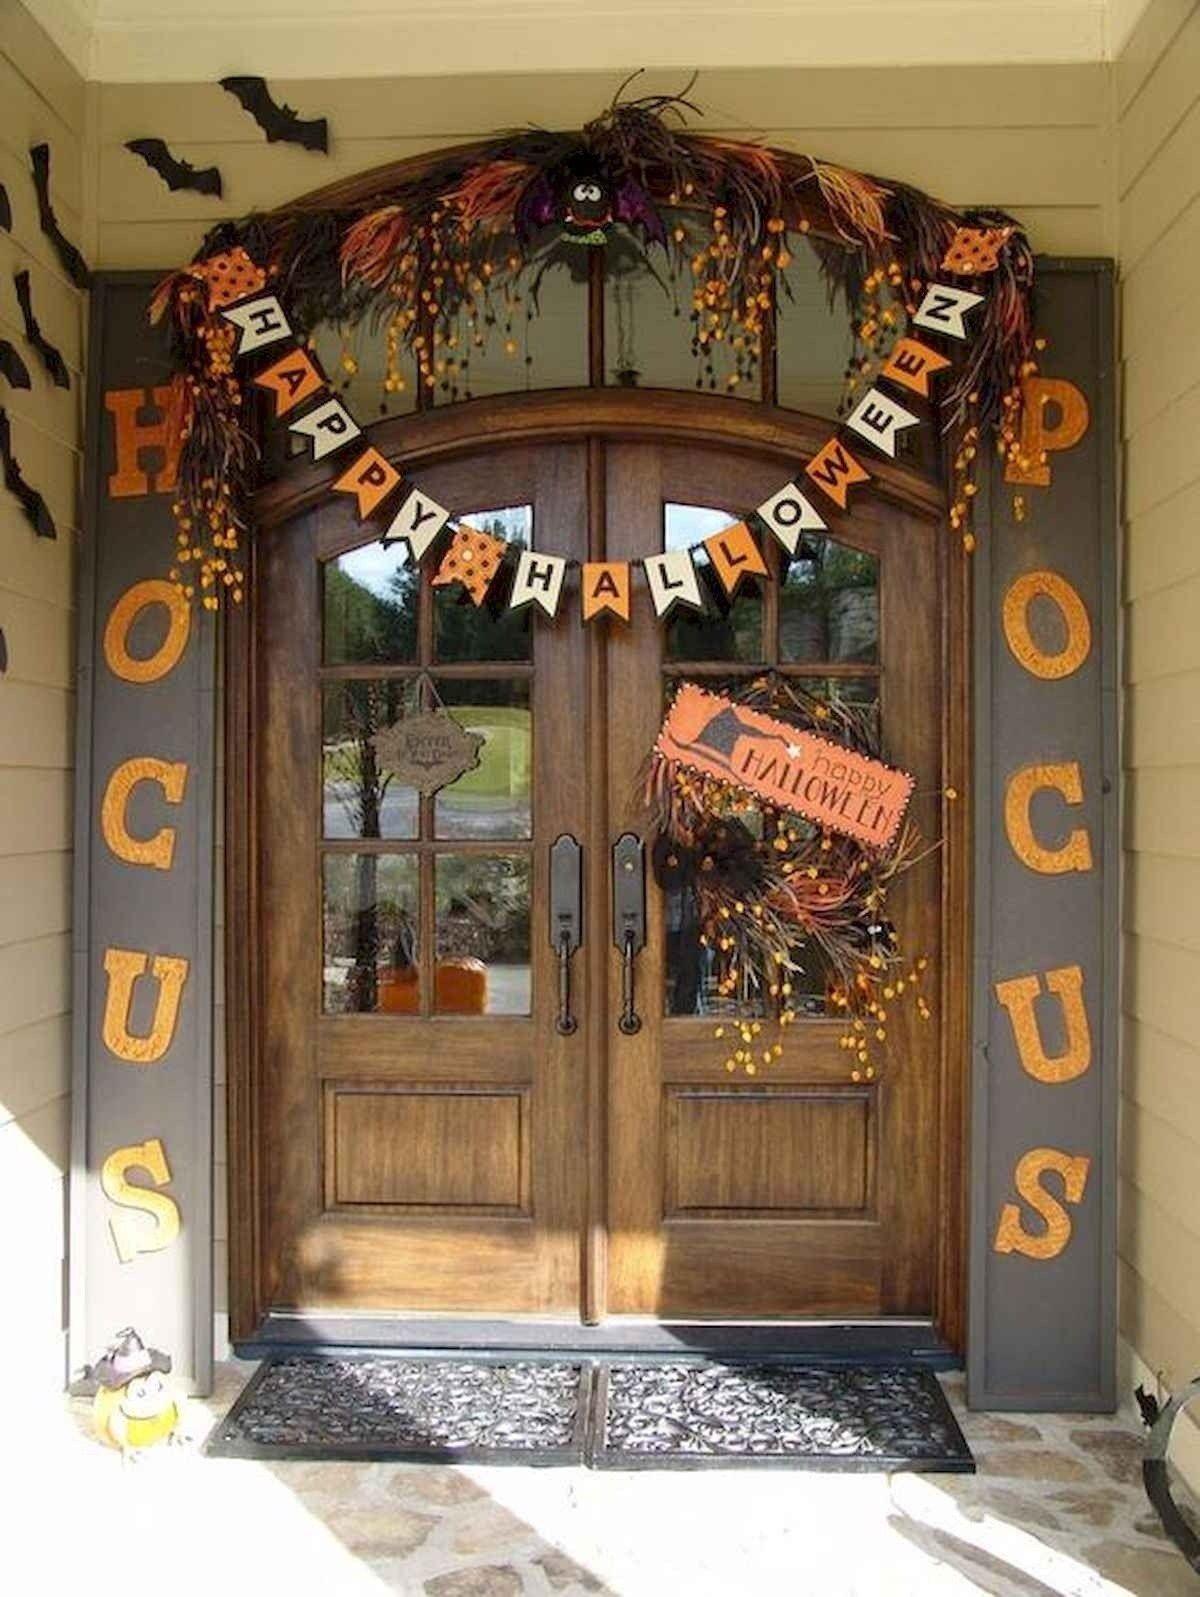 22 Chilling and Creative Halloween Porch Decorations #halloweendoordecorations